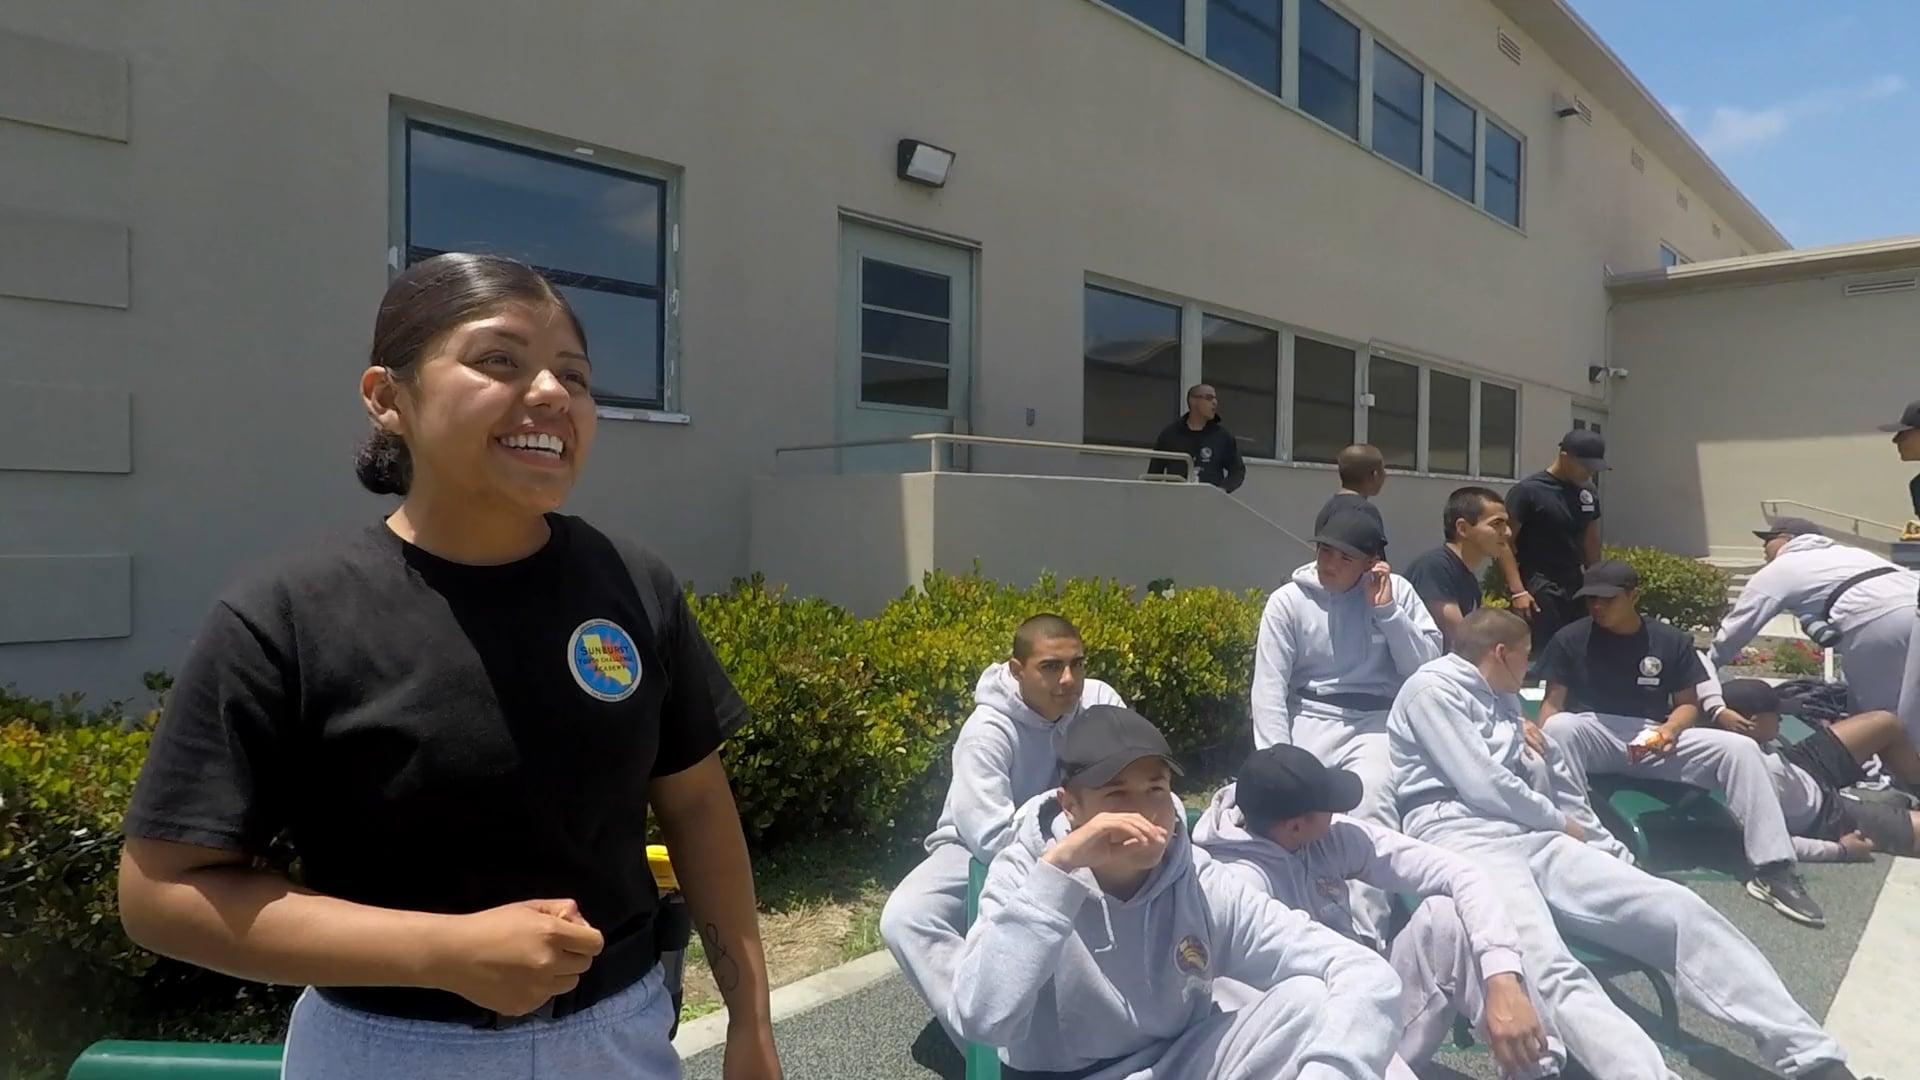 Marisol - Sunburst Youth Academy